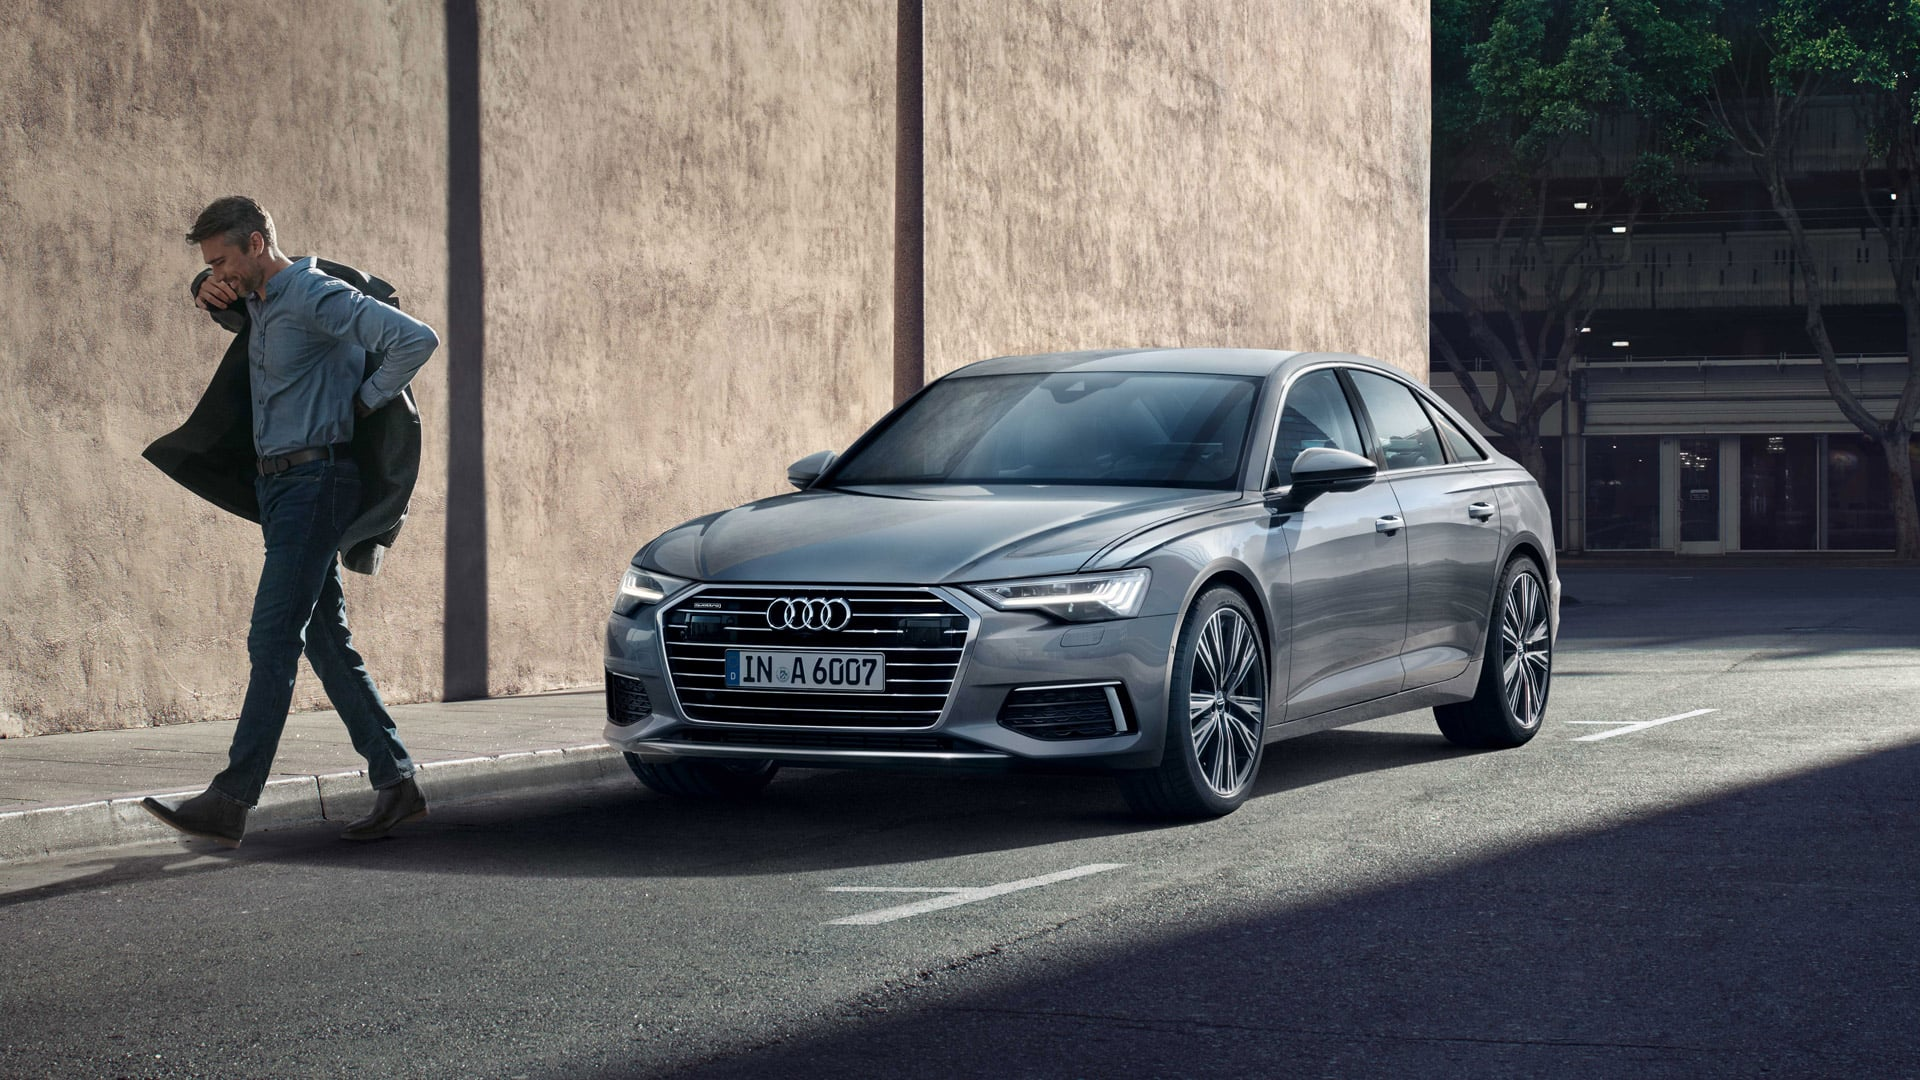 Nowy Standard W Klasie Biznes Audi A6 Limousine Gt A6